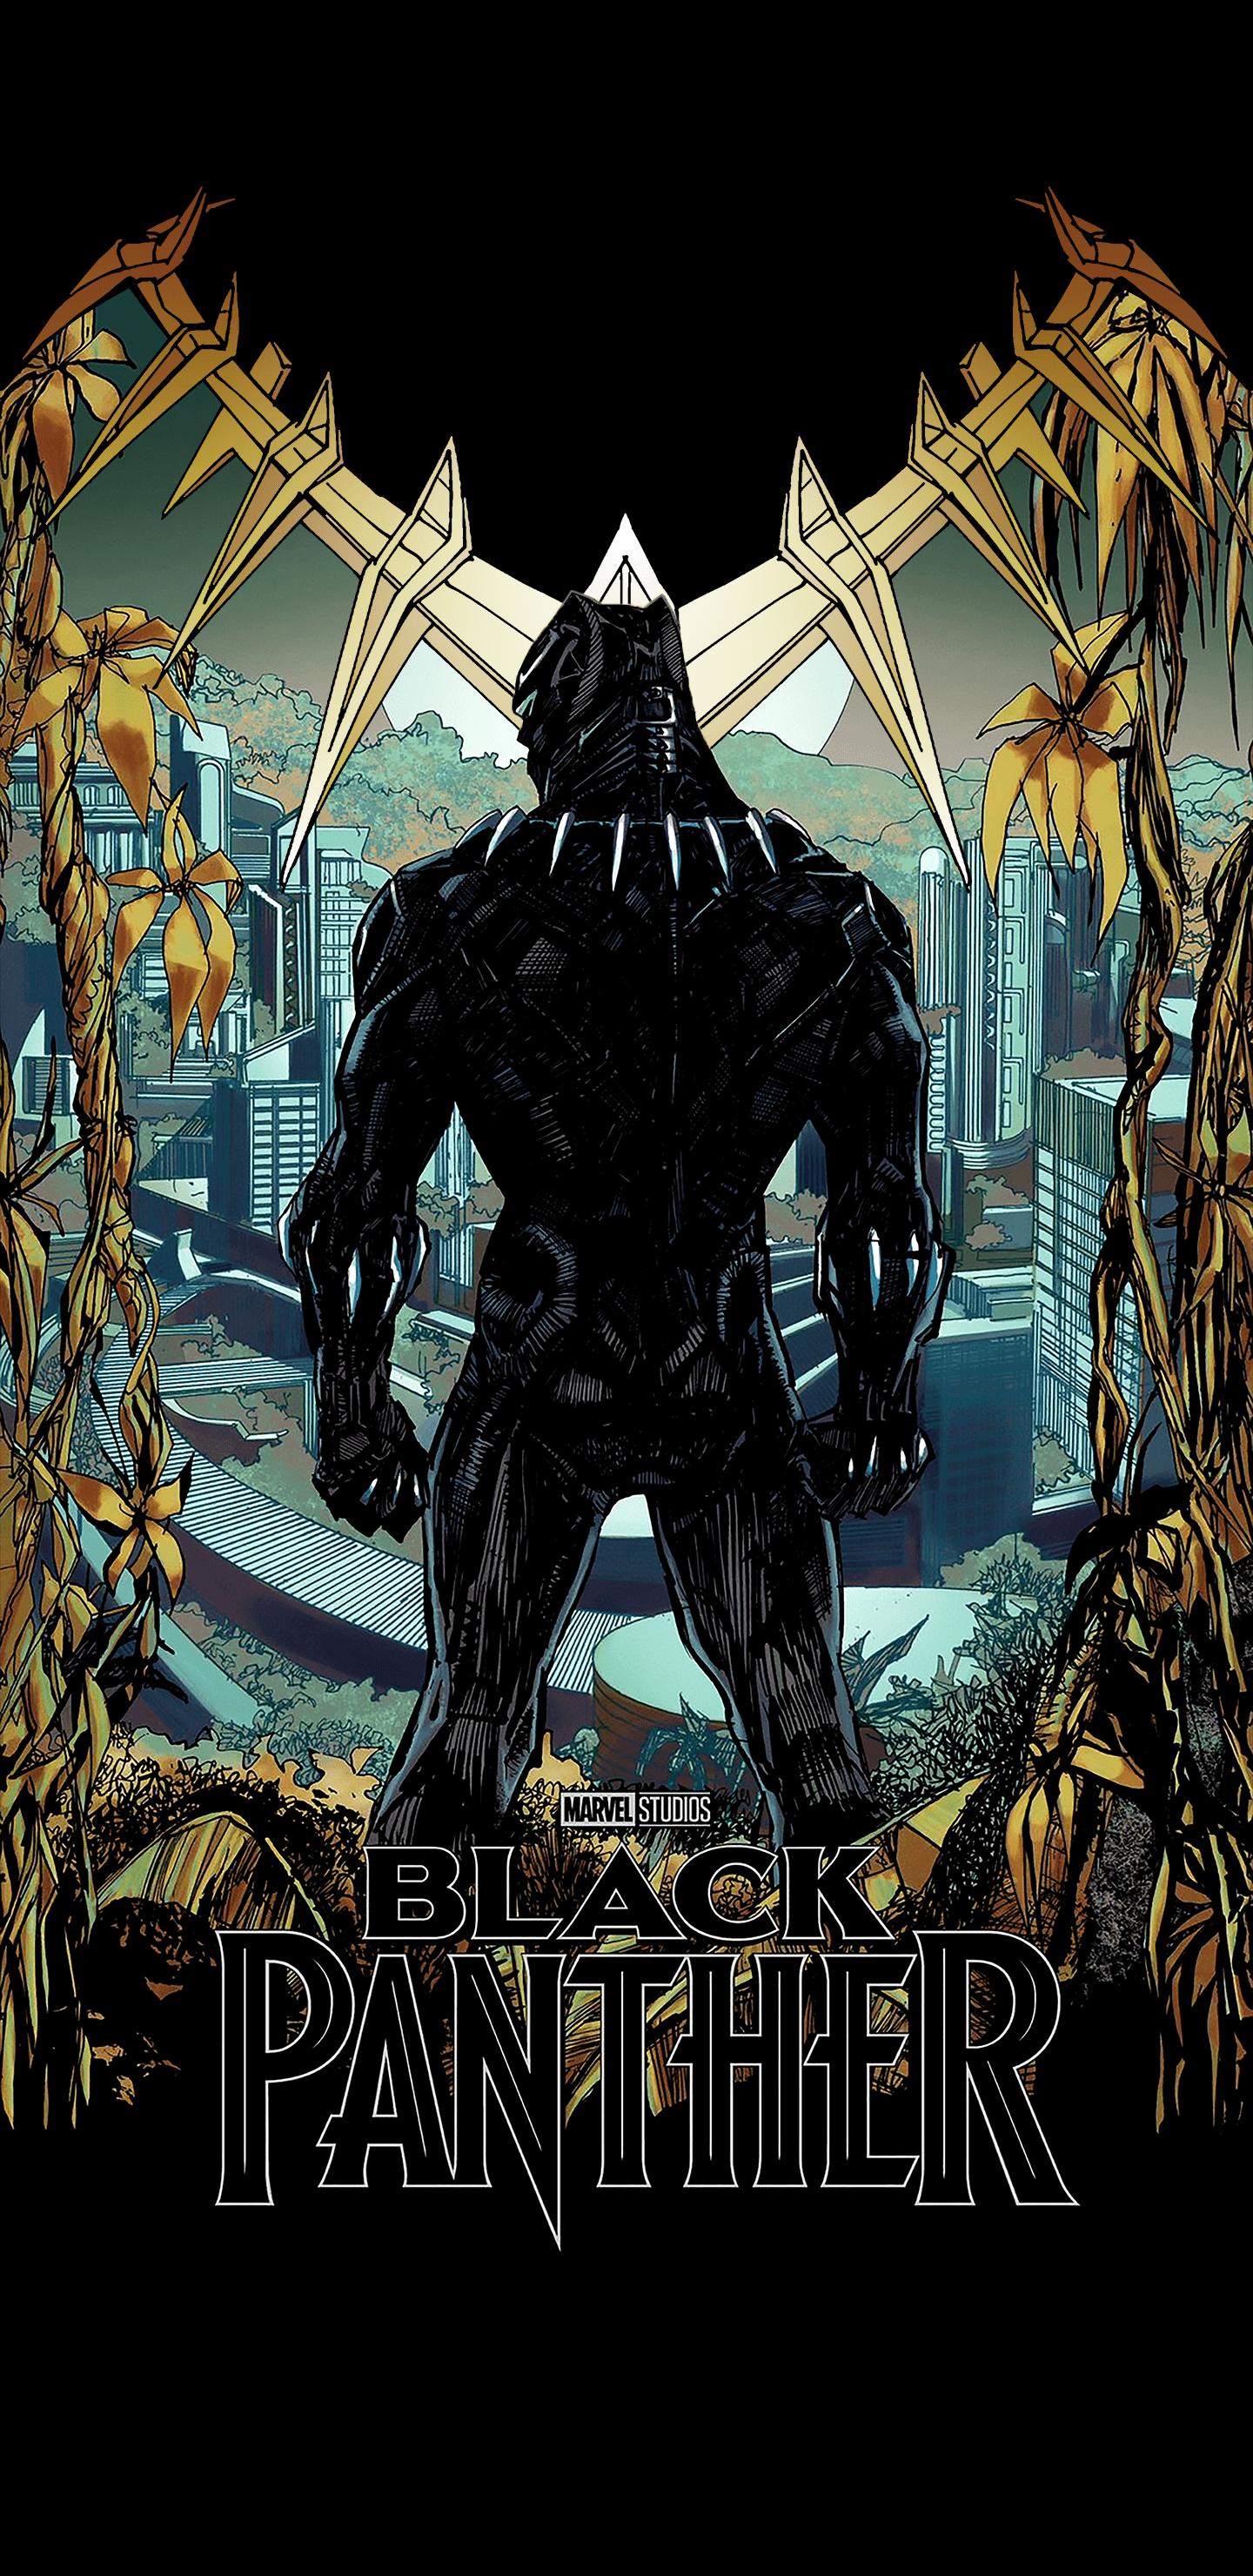 Black Panther iPhone Wallpapers - Top Free Black Panther